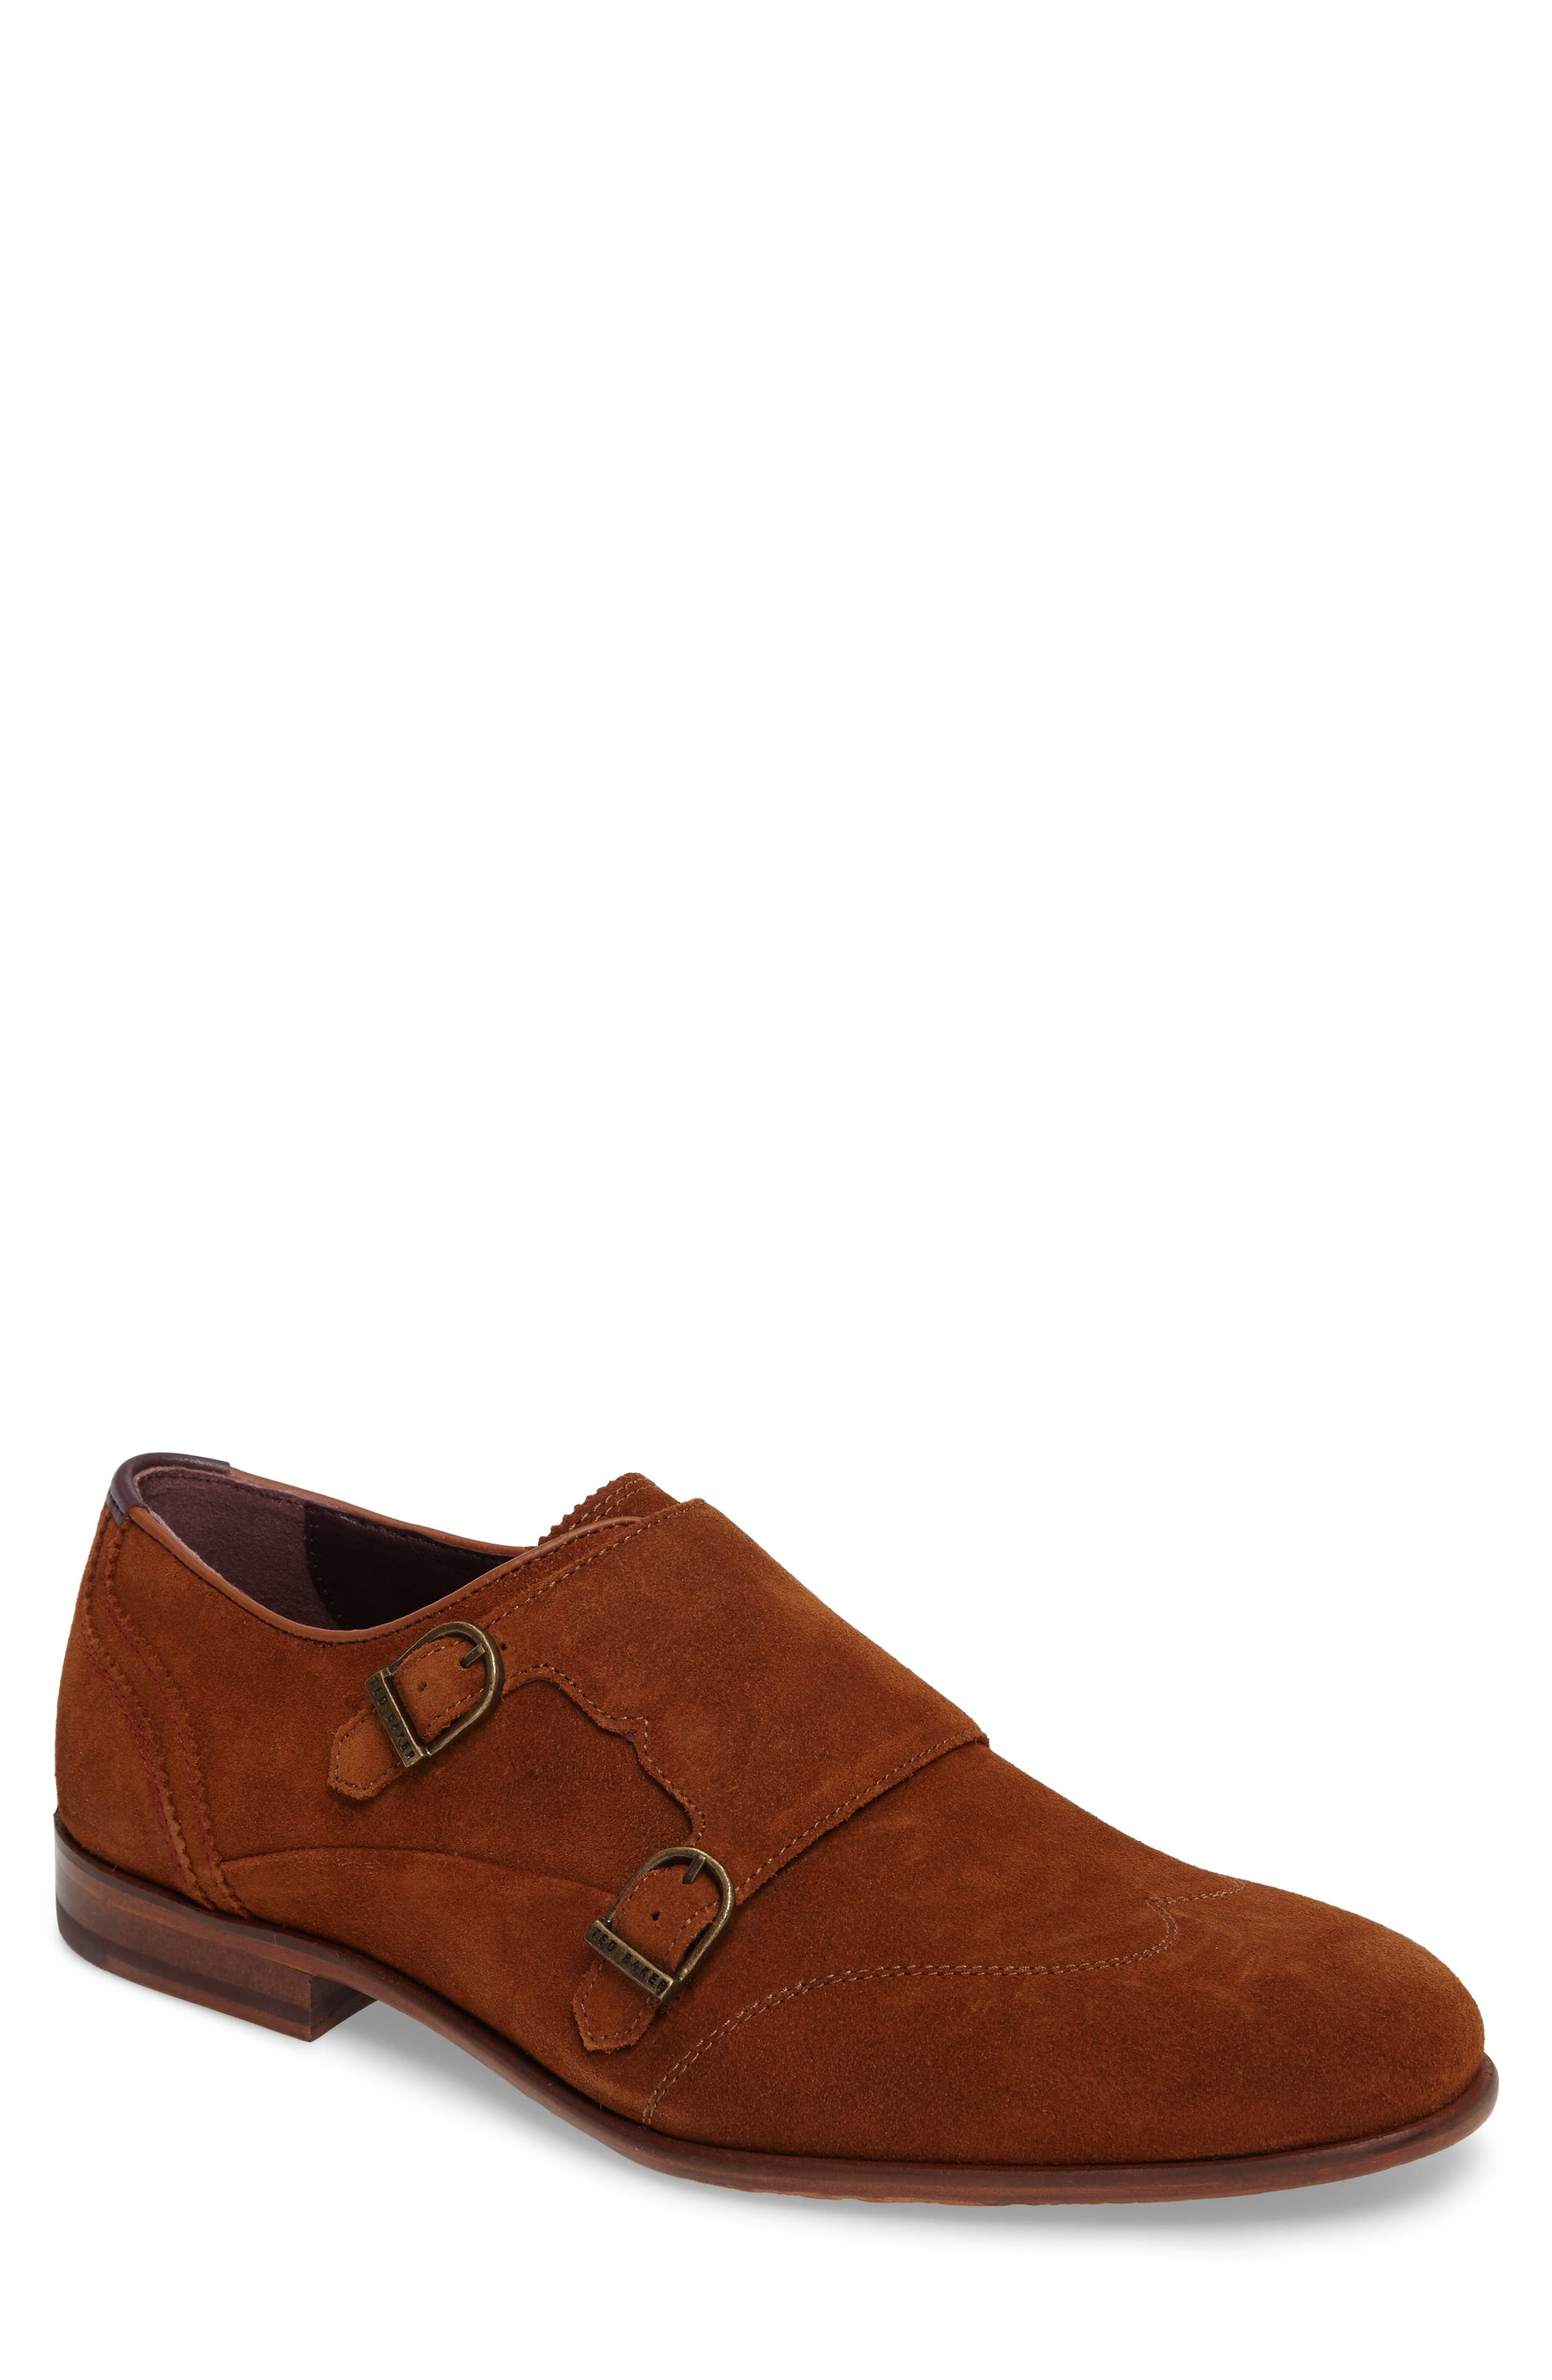 Alternate Image 1 Selected - Ted Baker London Rovere Wingtip Monk Shoe (Men)